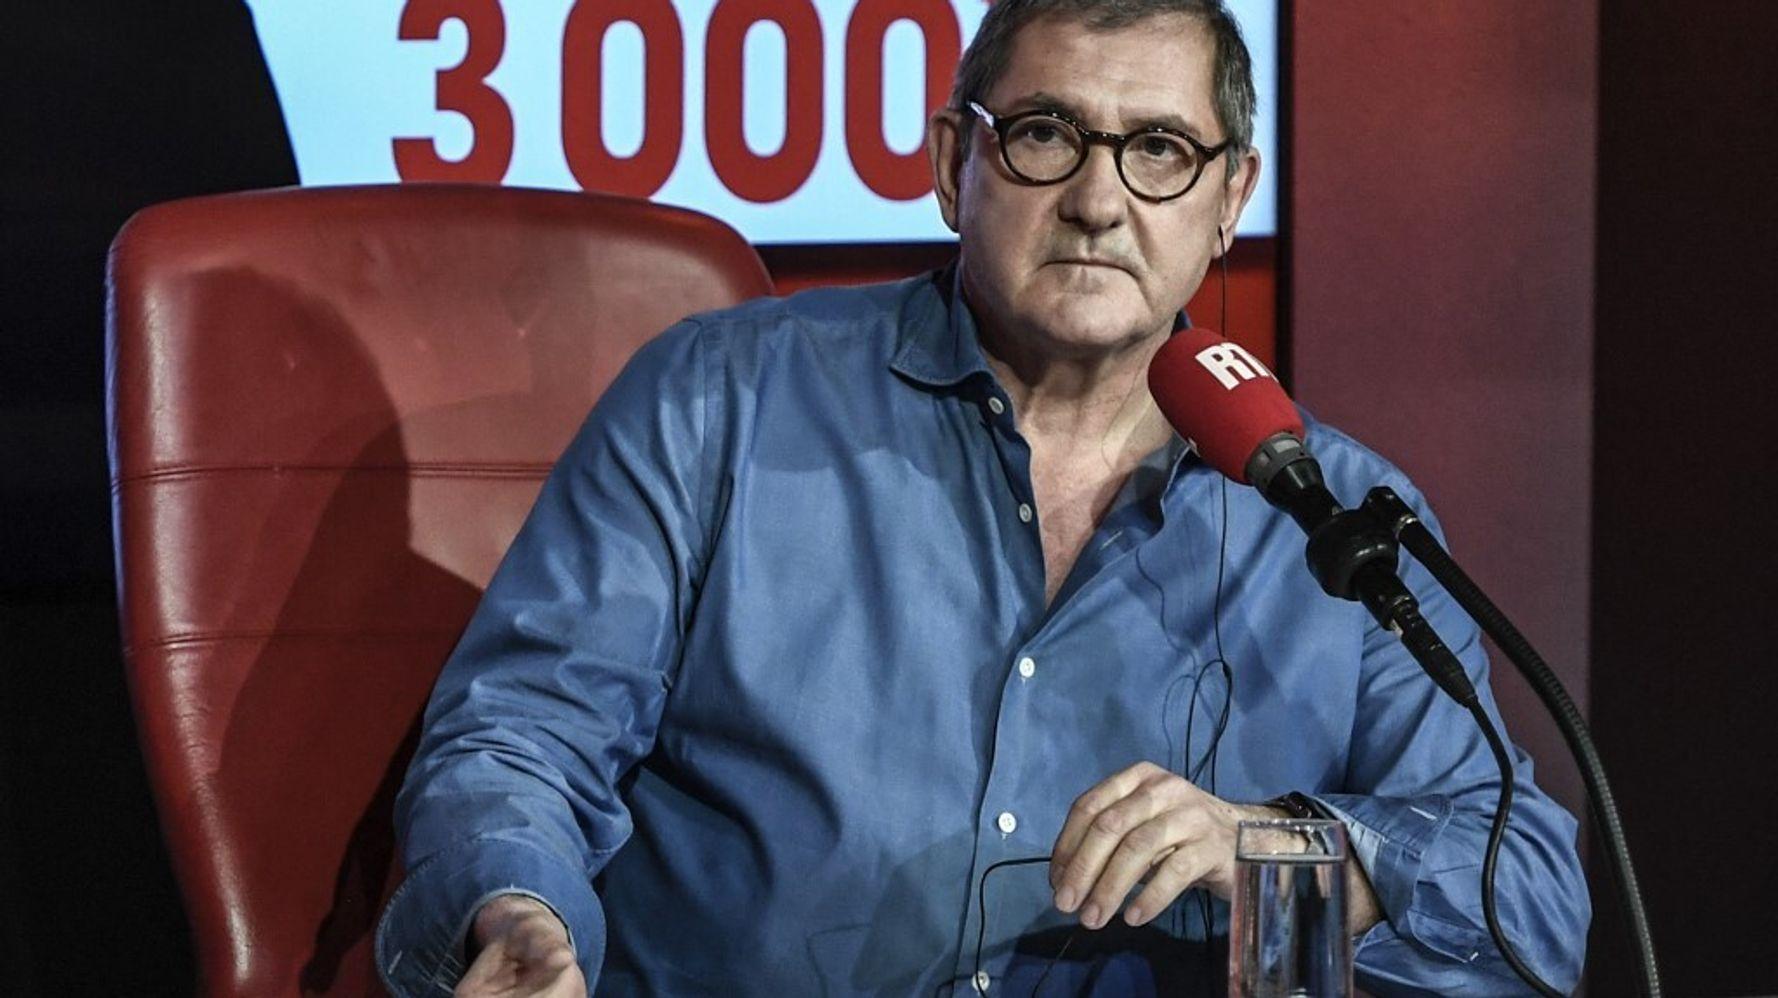 Yves Calvi et Natacha Polony rejoignent BFMTV en soirée